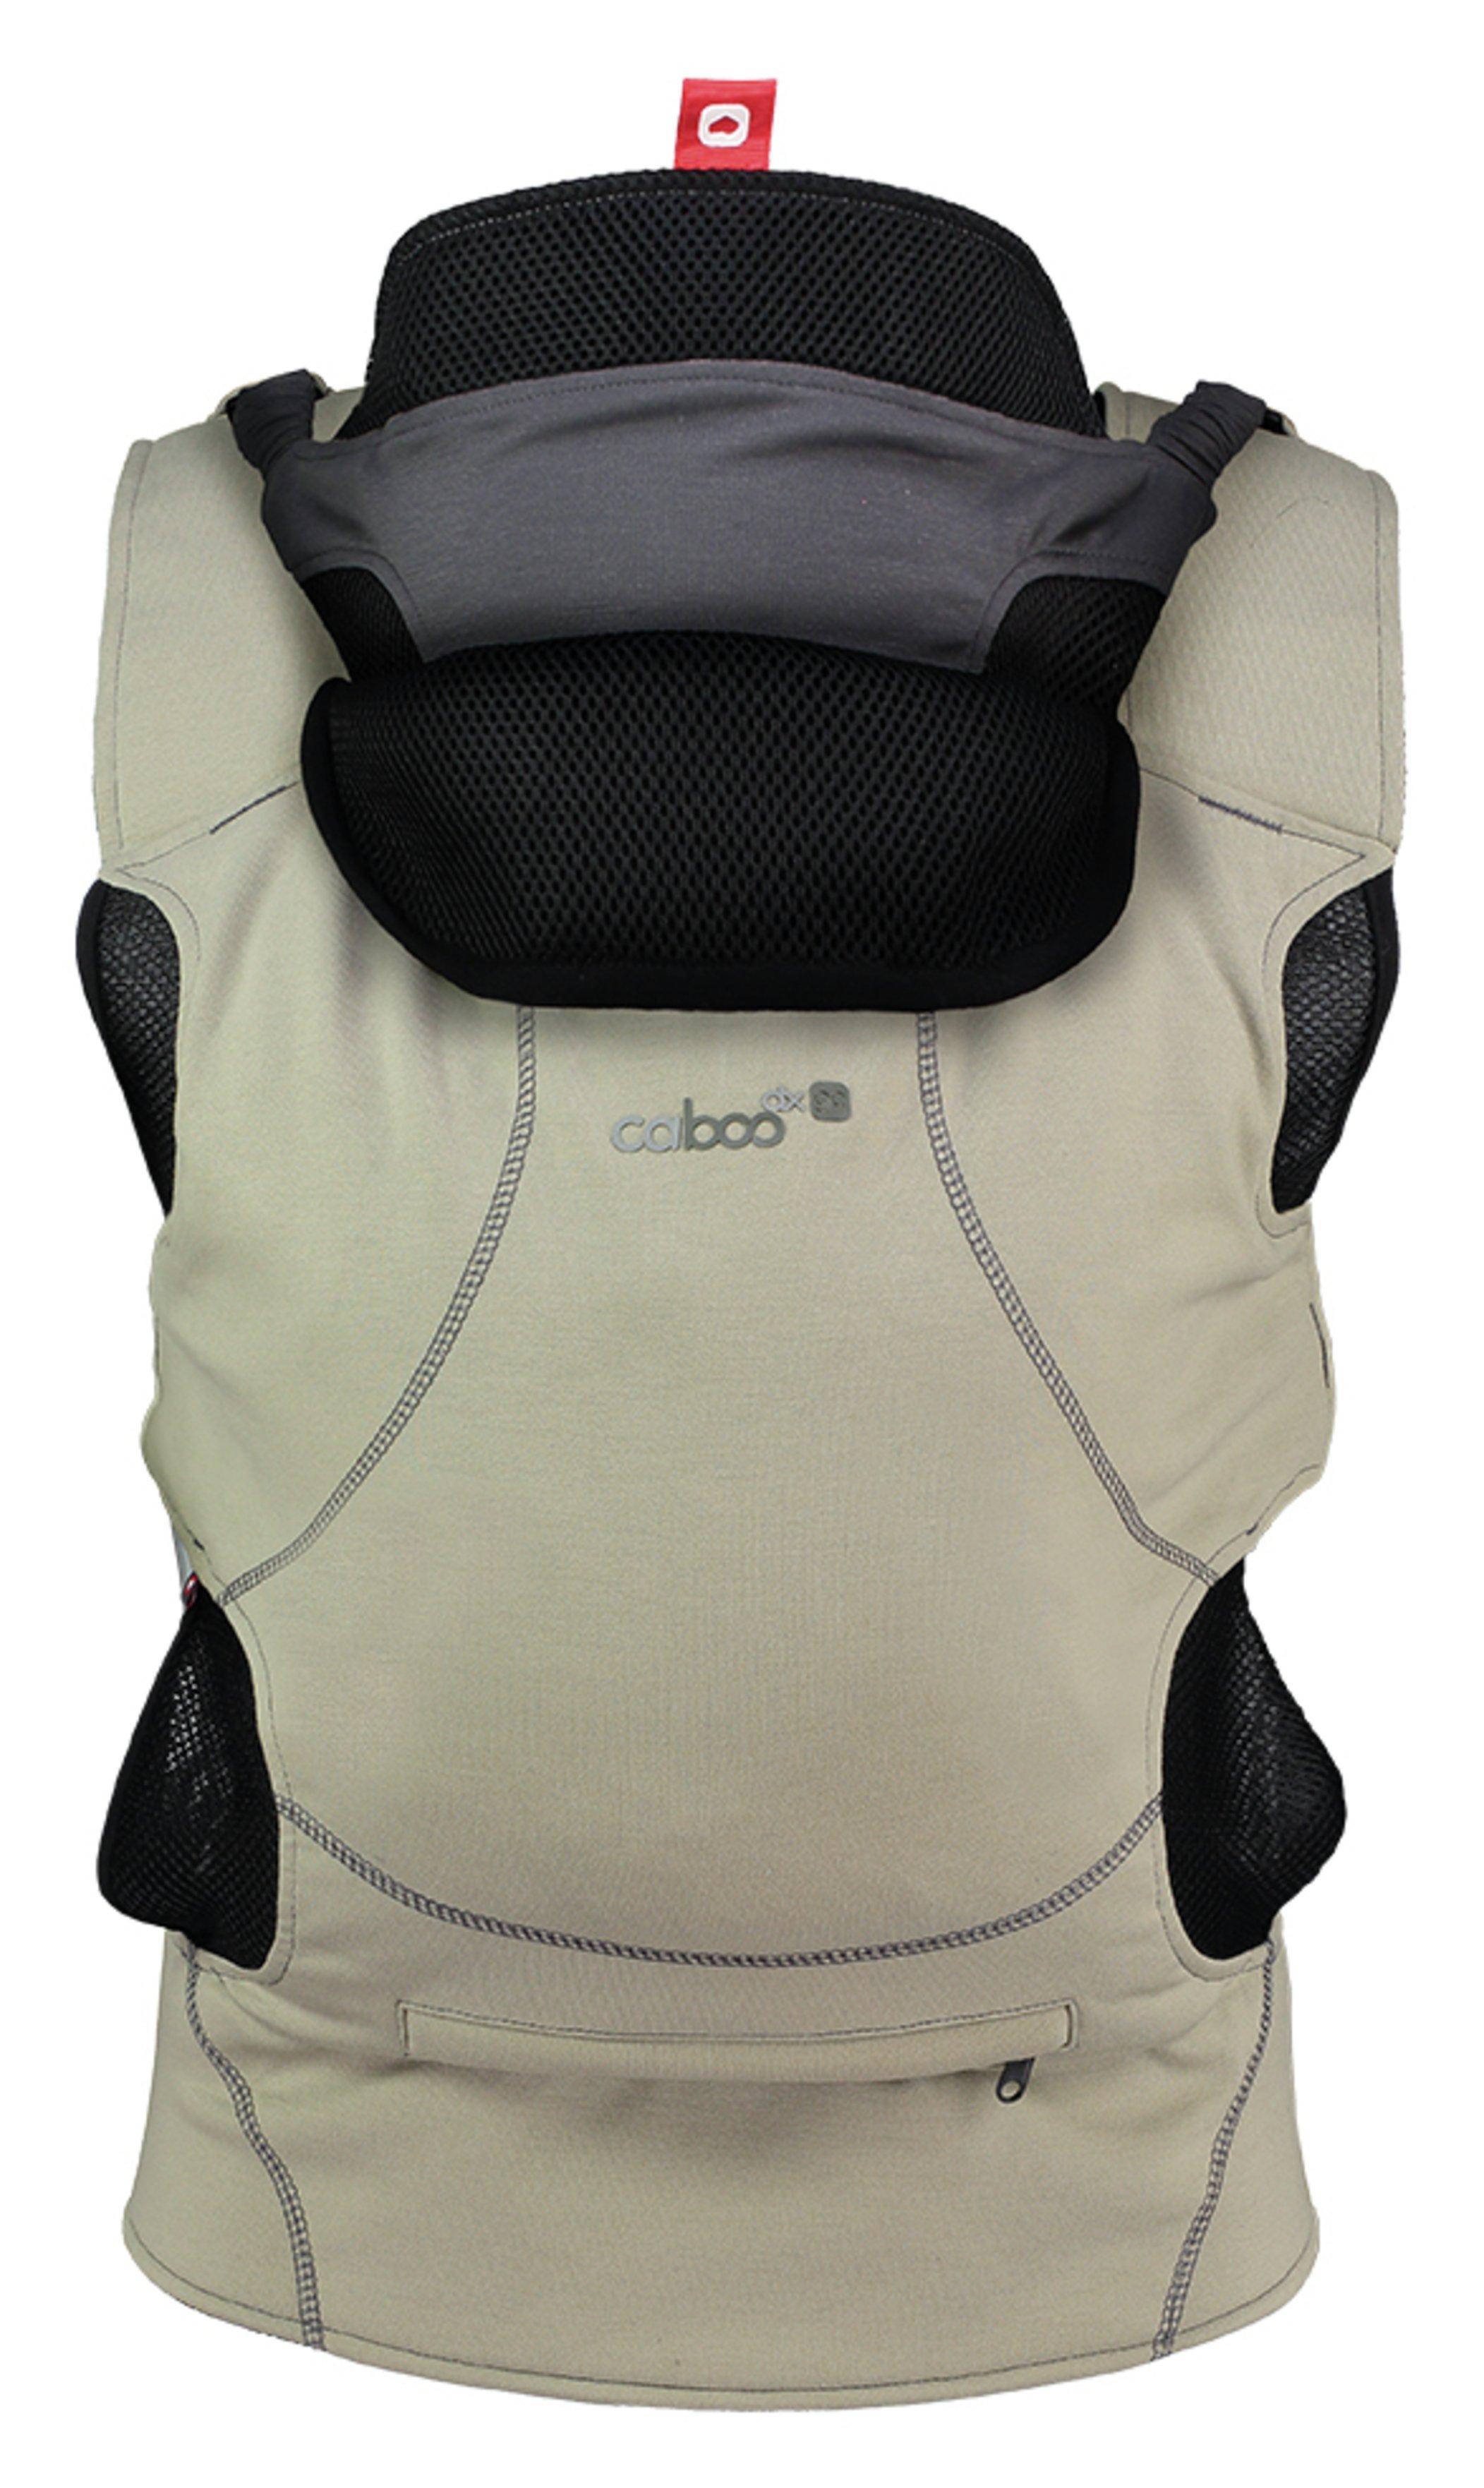 Caboo DXGO Baby Carrier - Khaki